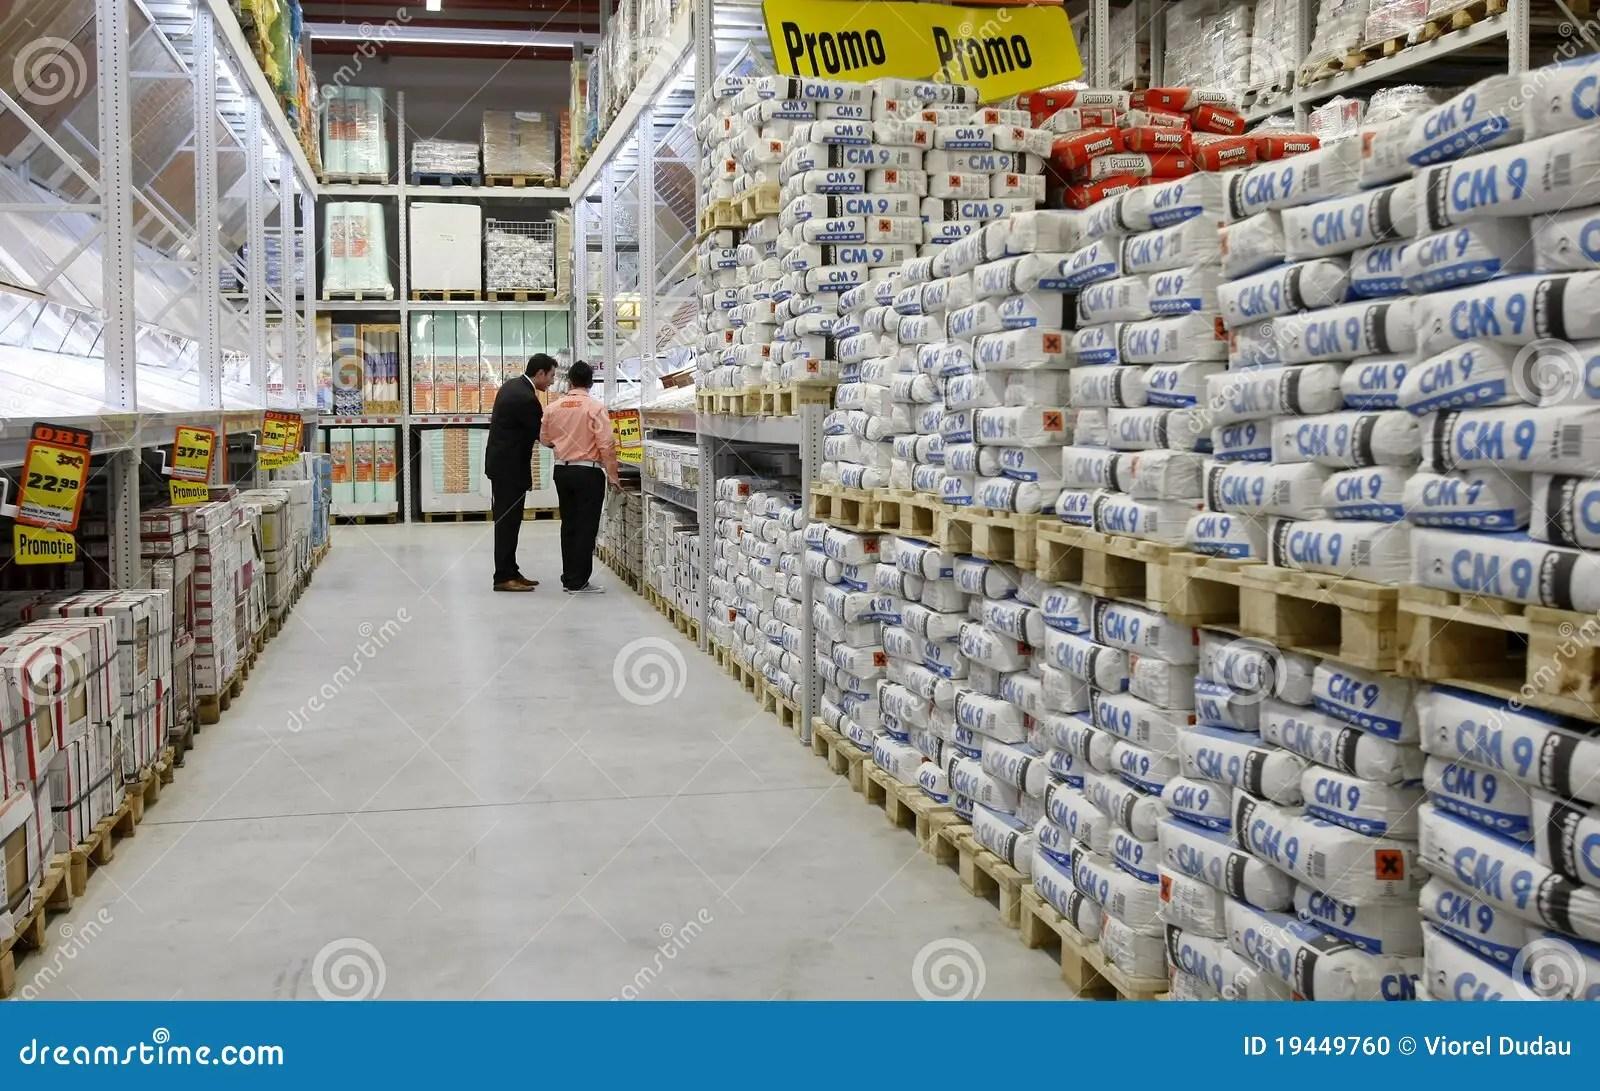 Home Depot Store Shopping